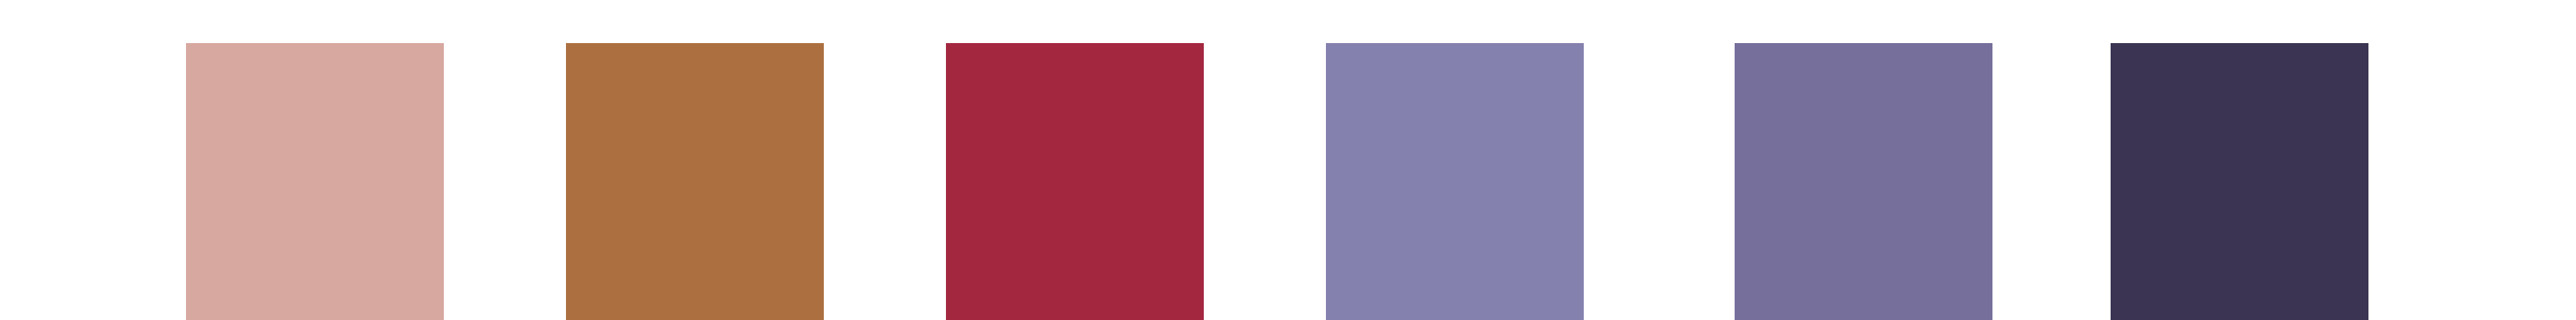 2020 pix 114